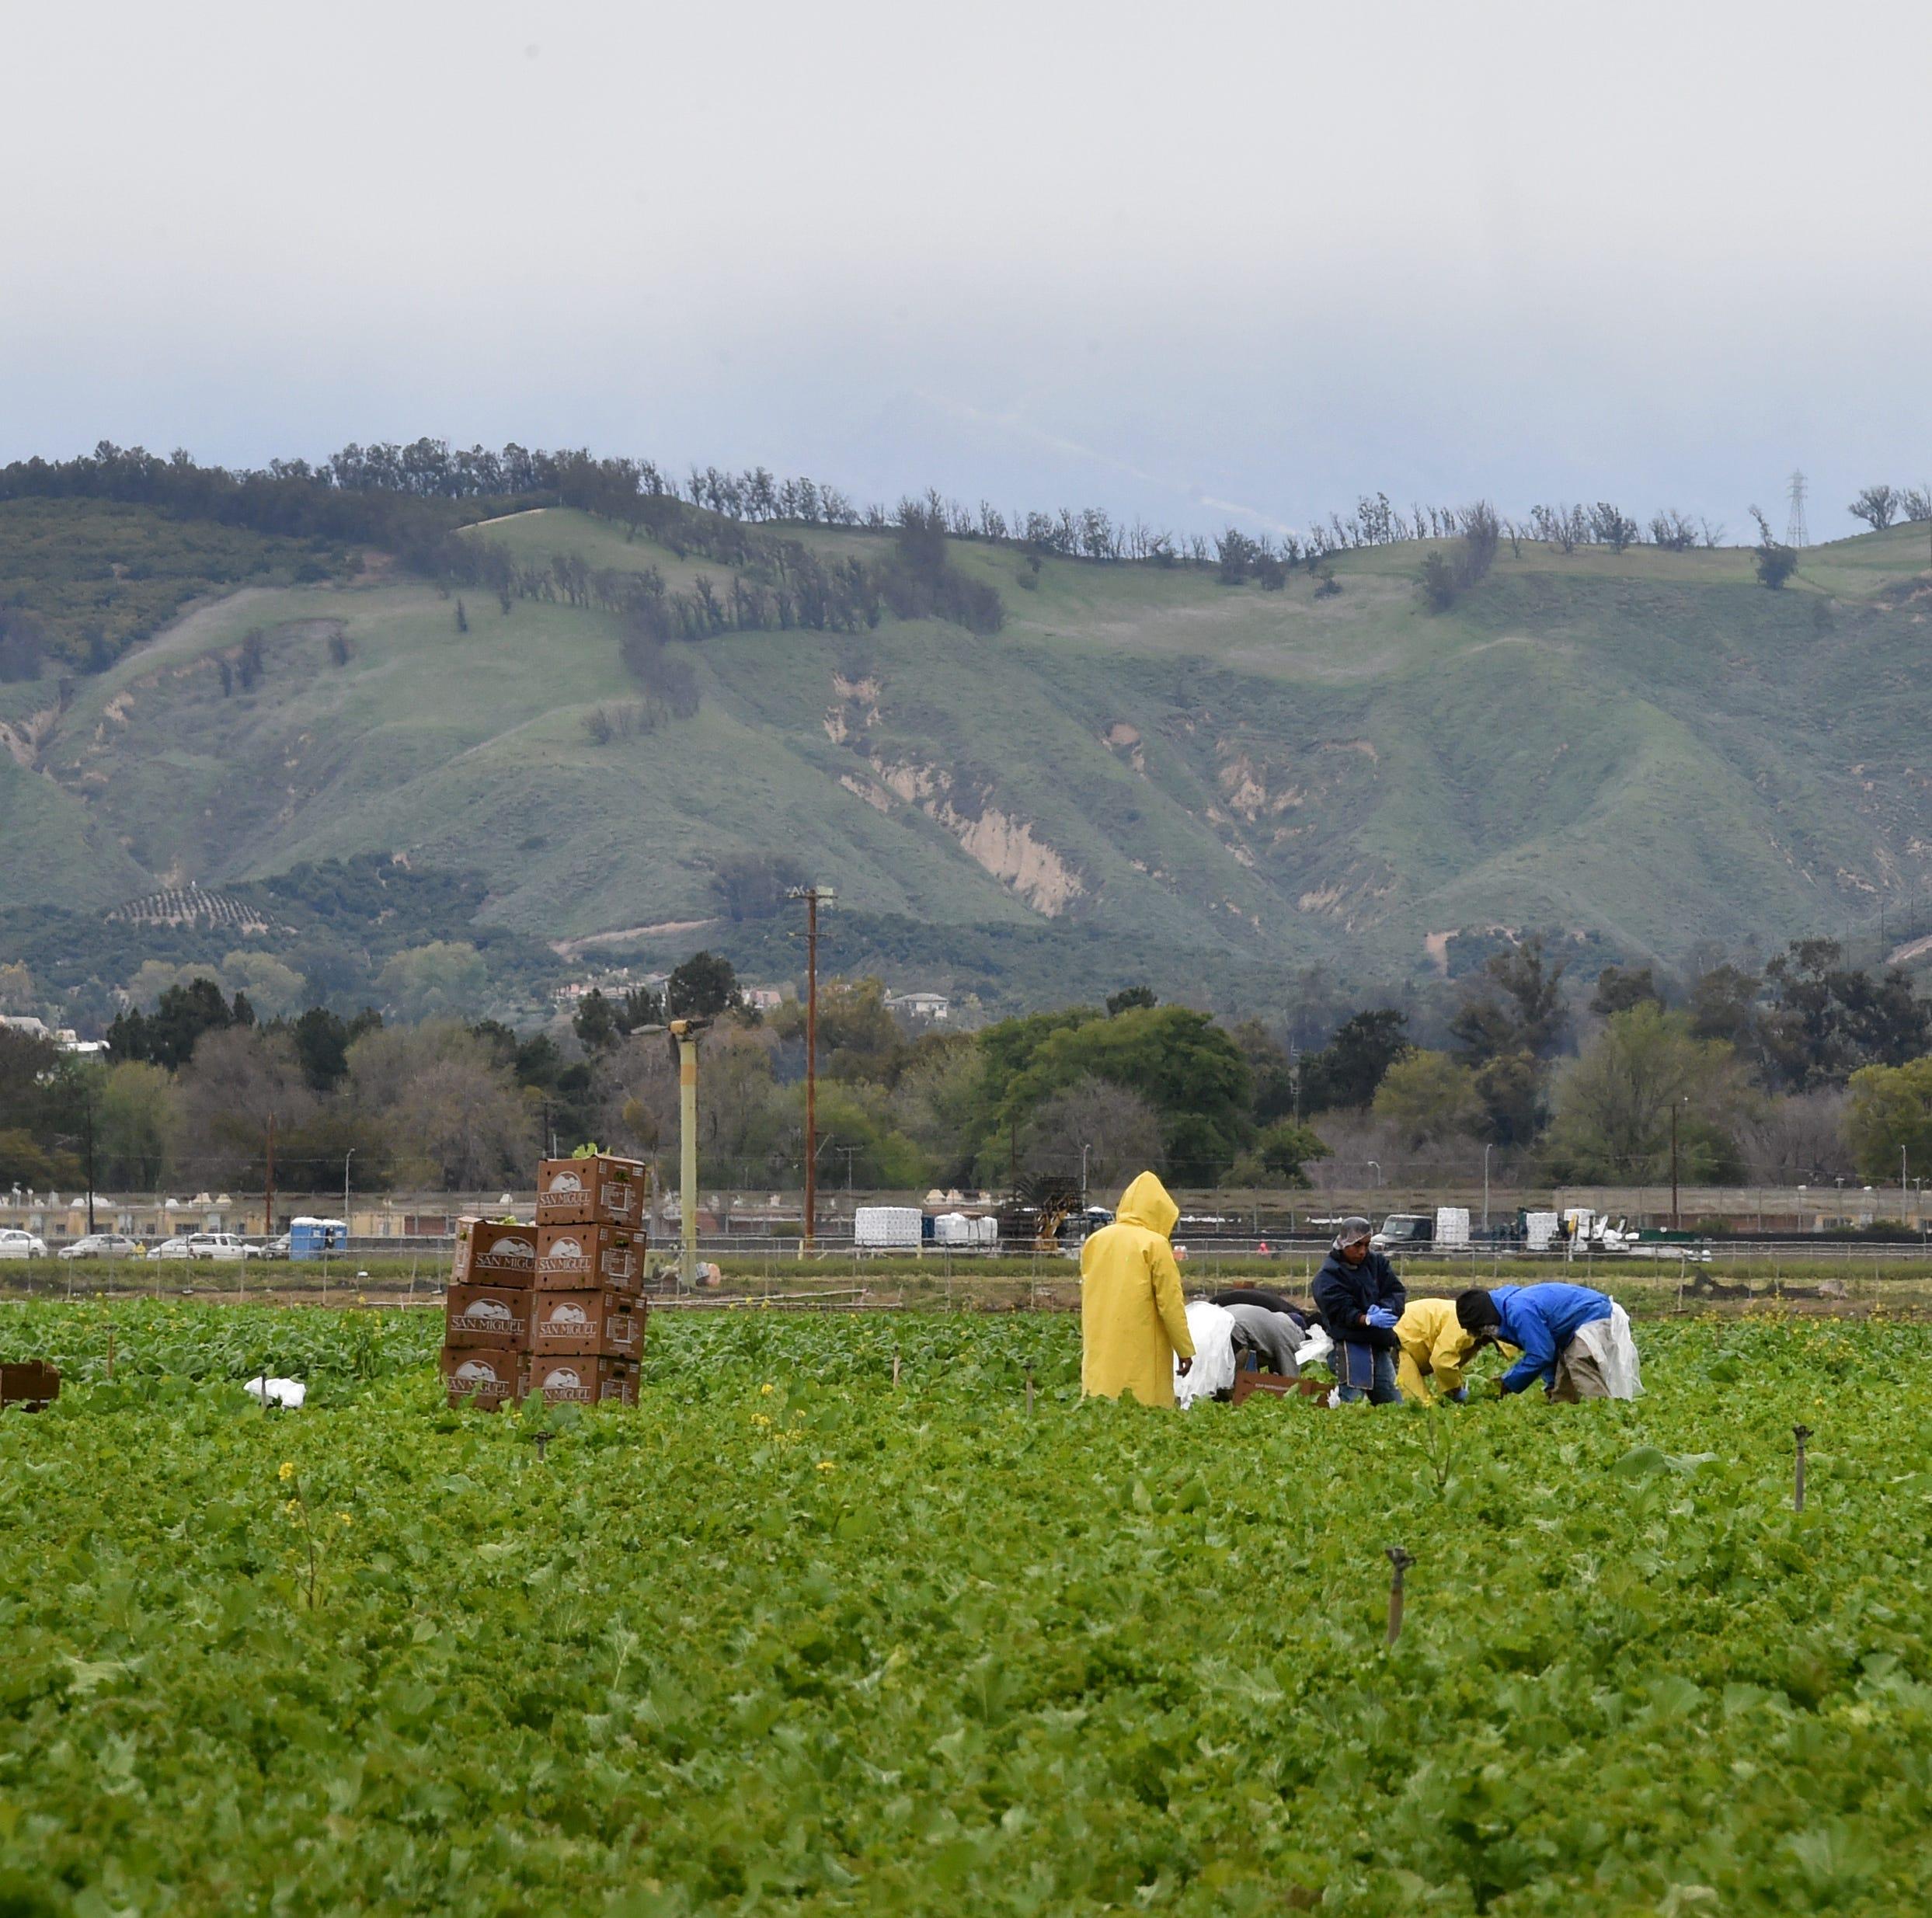 Storm rolls through Ventura County as farmers welcome steady rains